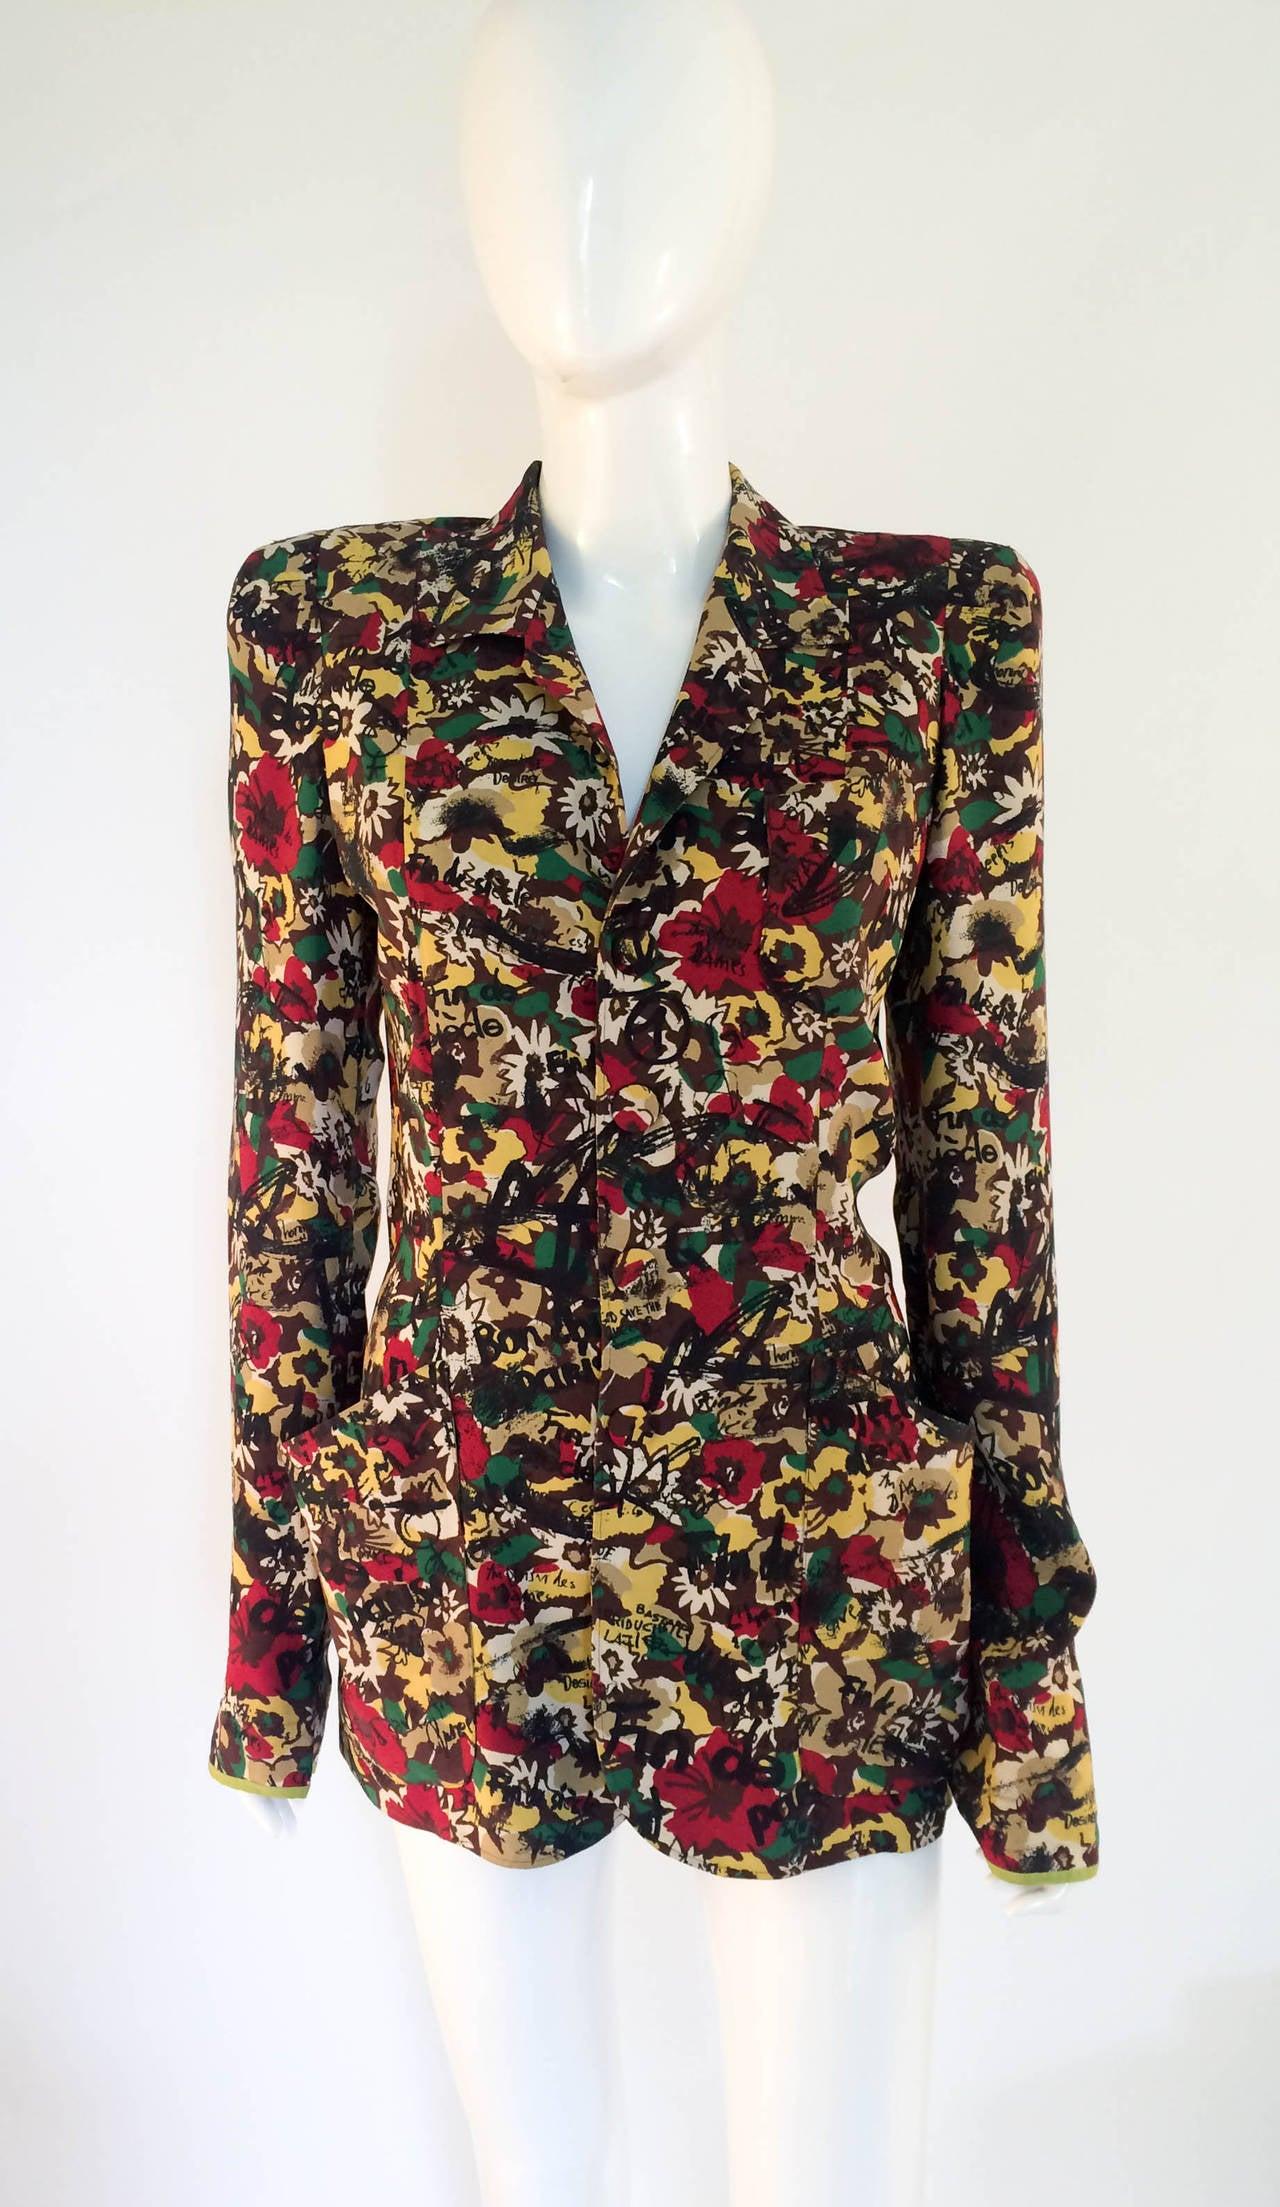 jean paul gaultier printed jacket 1985 at 1stdibs. Black Bedroom Furniture Sets. Home Design Ideas